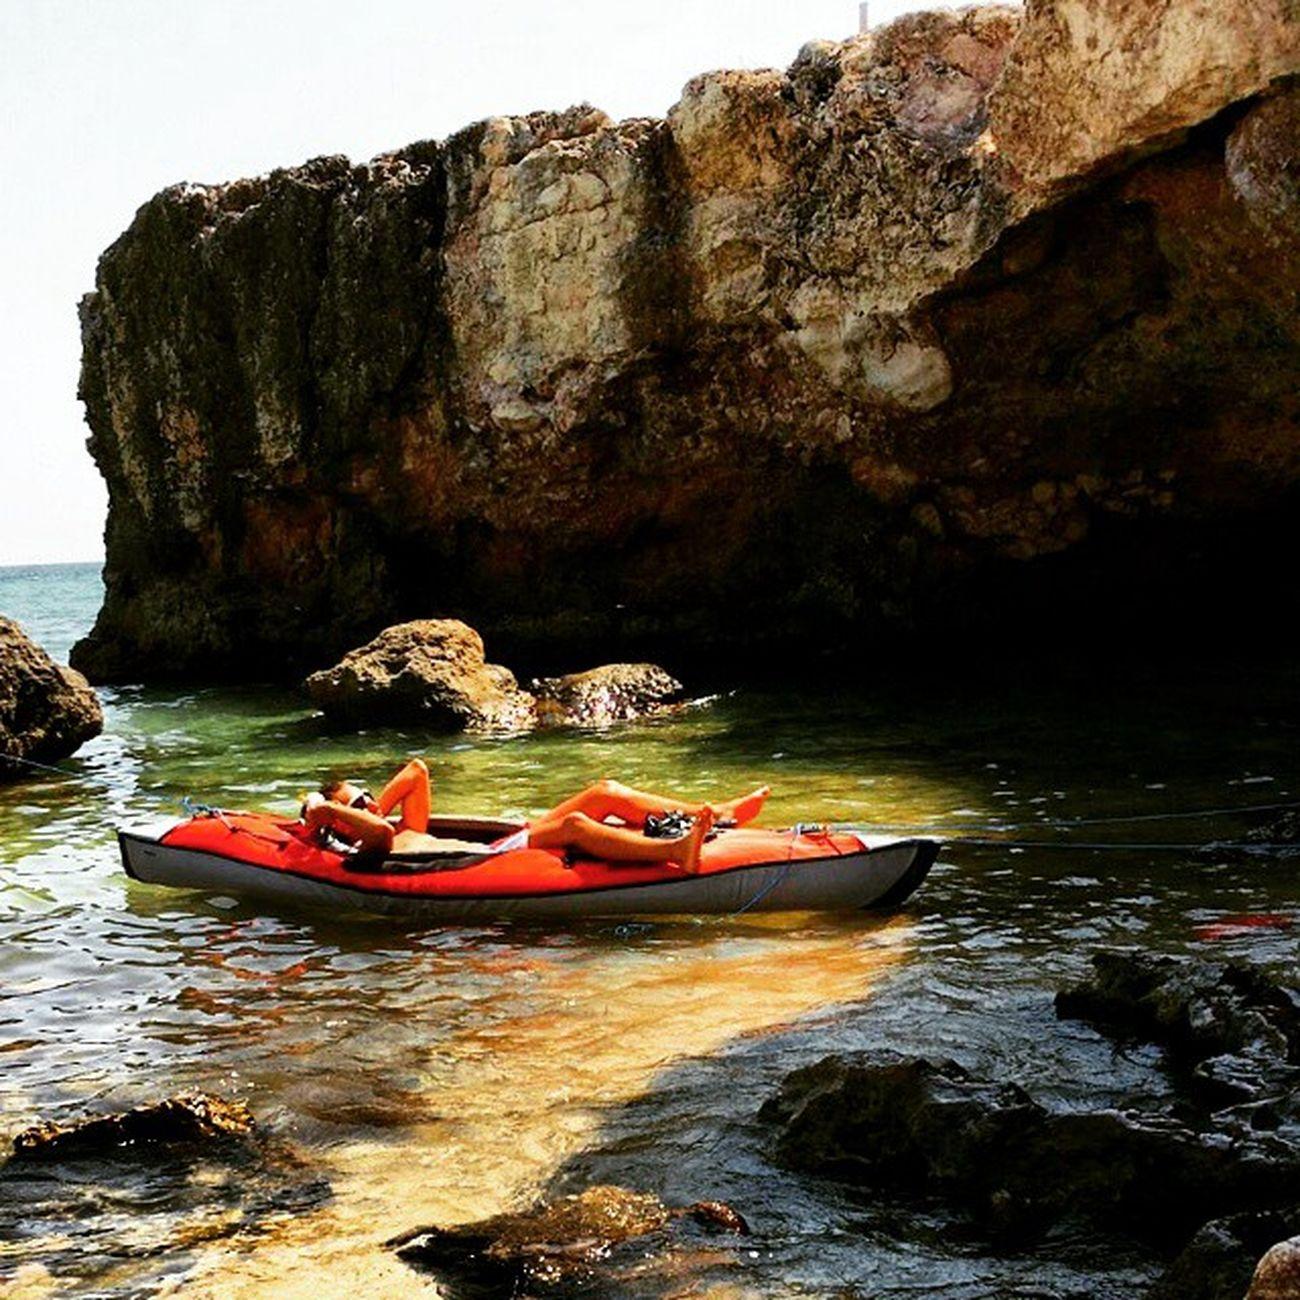 Relax Postallenamento Kayakeggiando Kayak Altomare Monopoli Top Picoftheday Summer Summertime Amaca